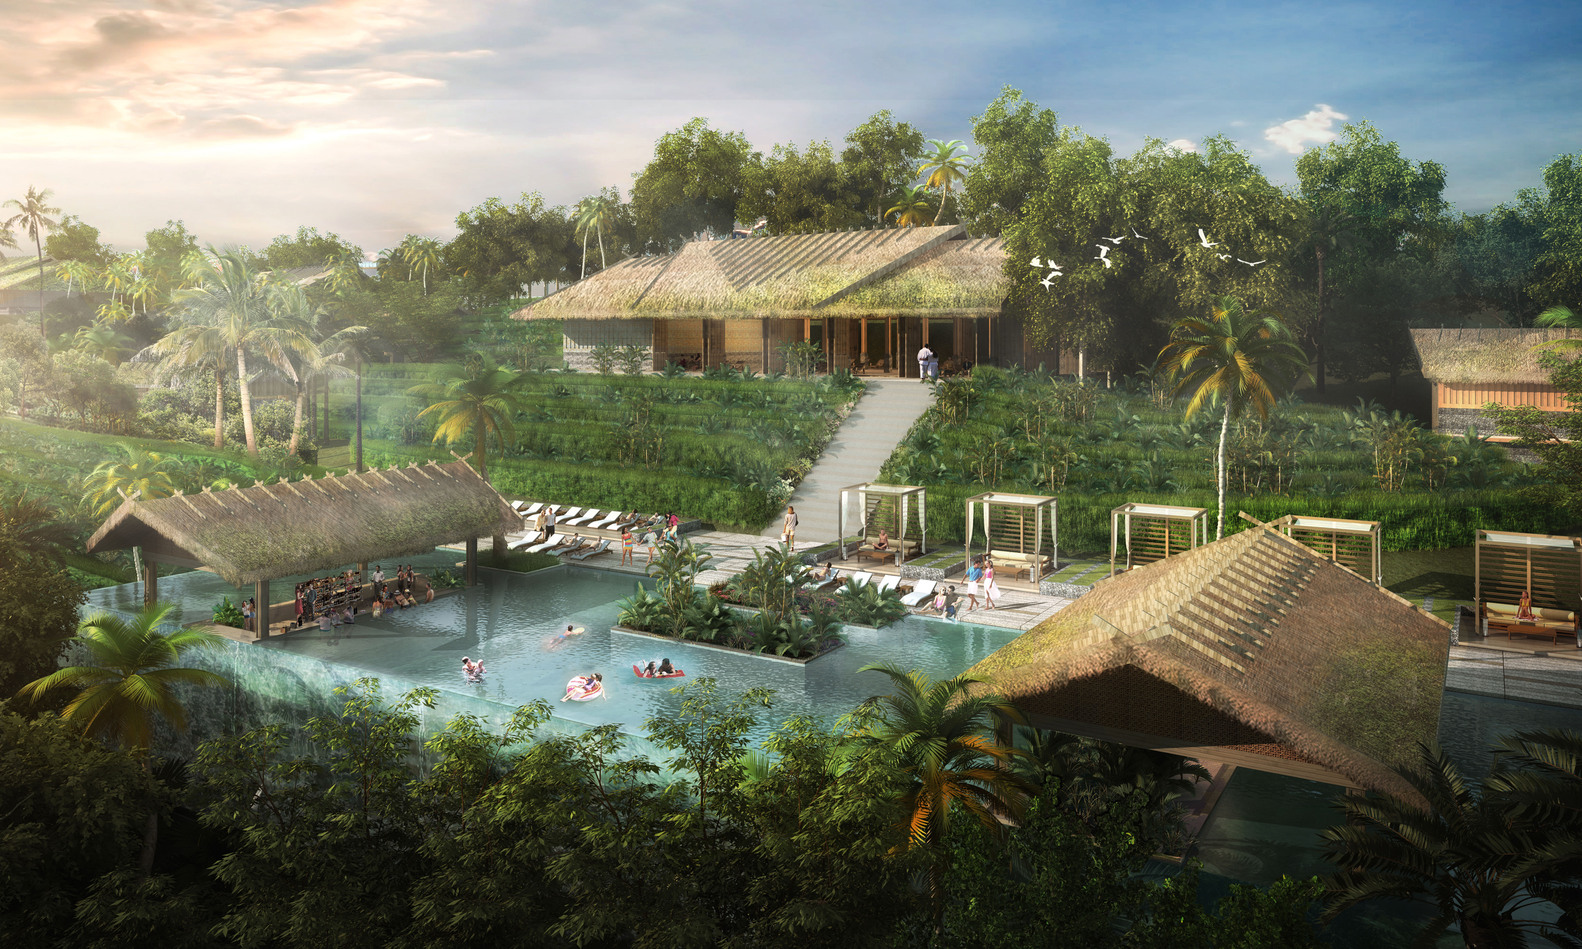 Курорт во Вьетнаме - 3D | Зеленые крыши